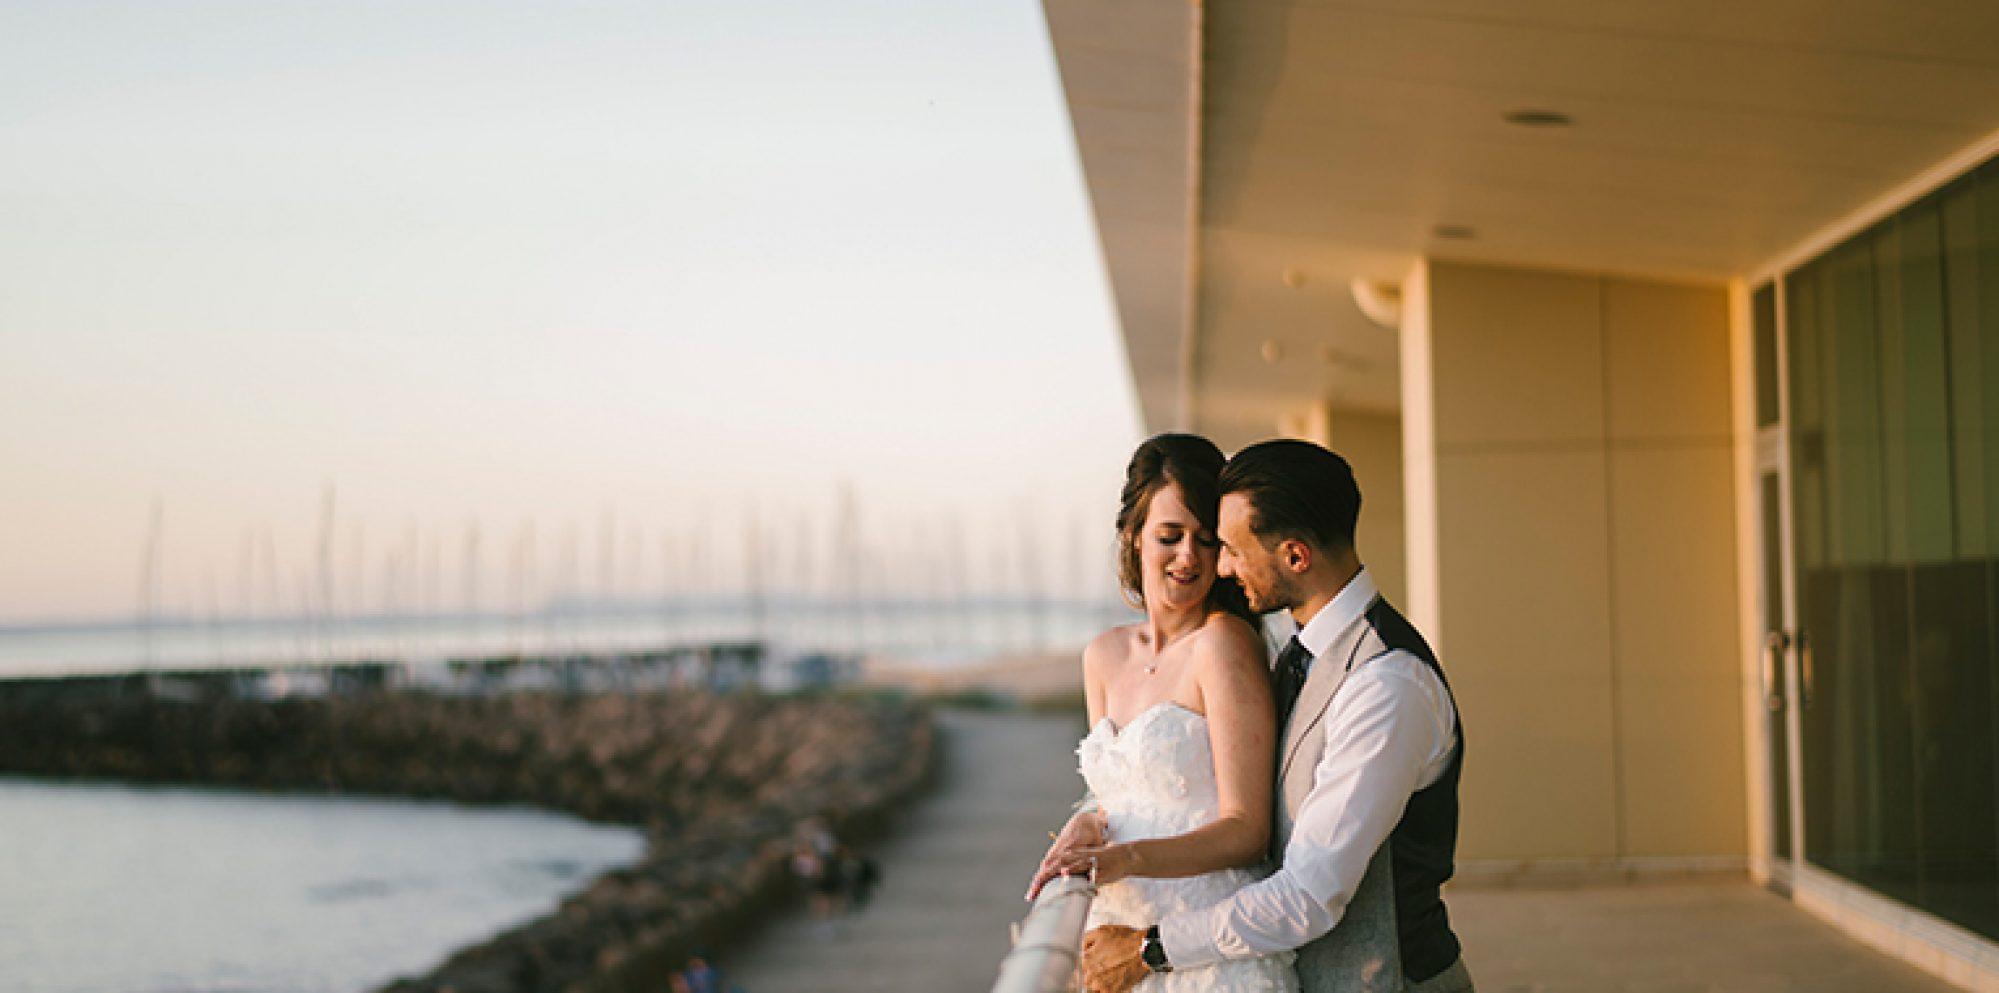 Rania & louis wedding photography @ sandringham yacht club